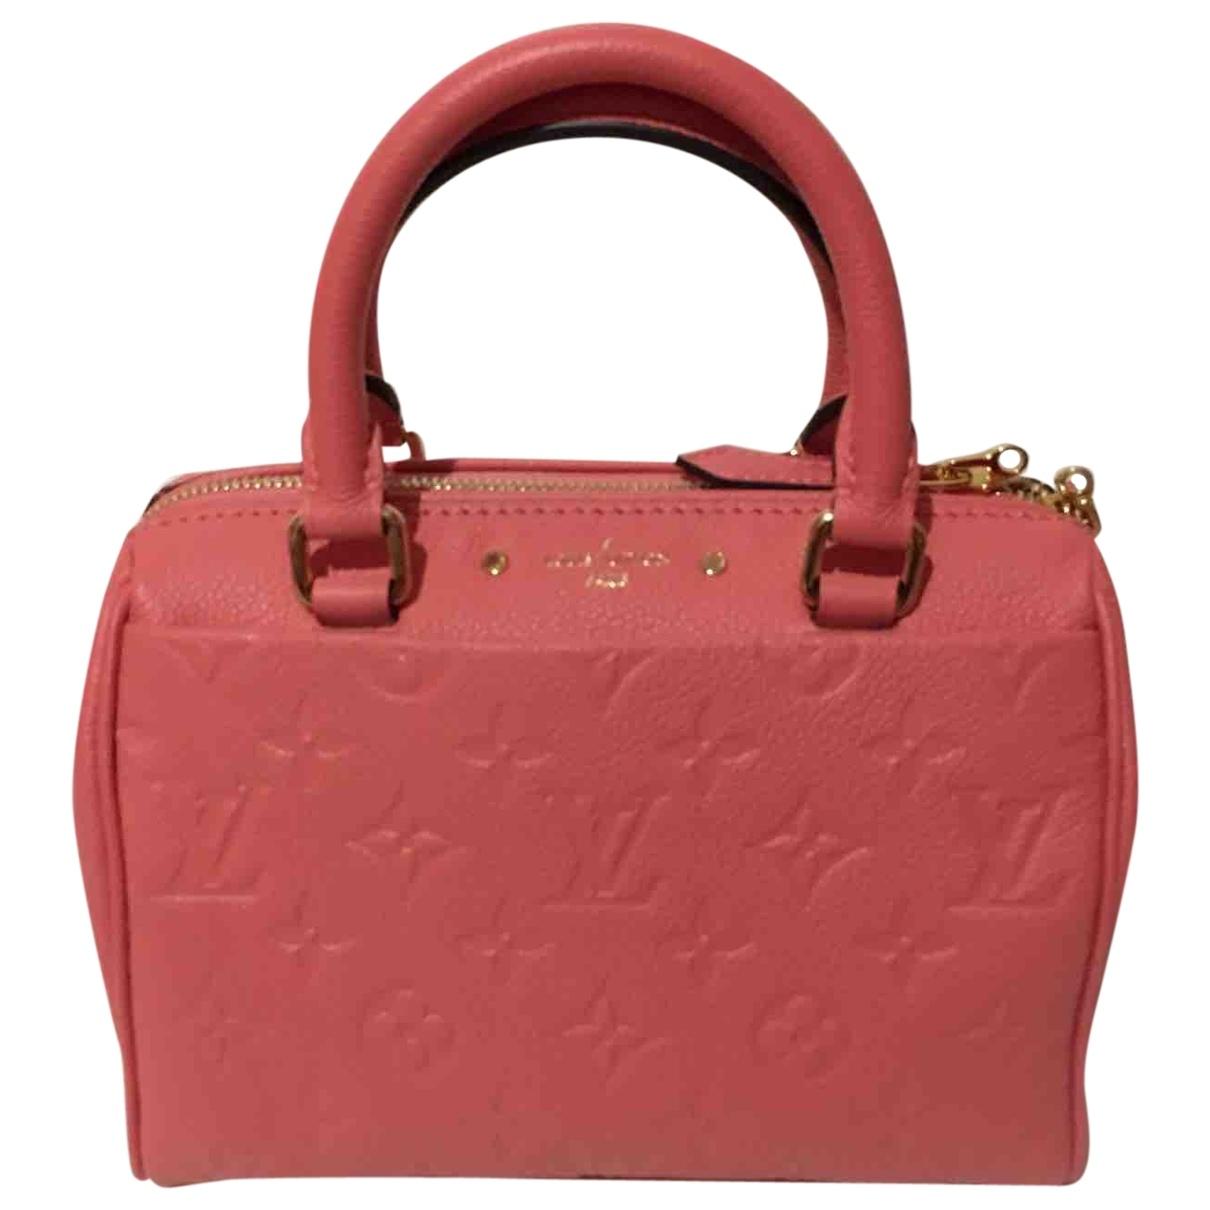 Bolso  Speedy Bandouliere de Cuero Louis Vuitton